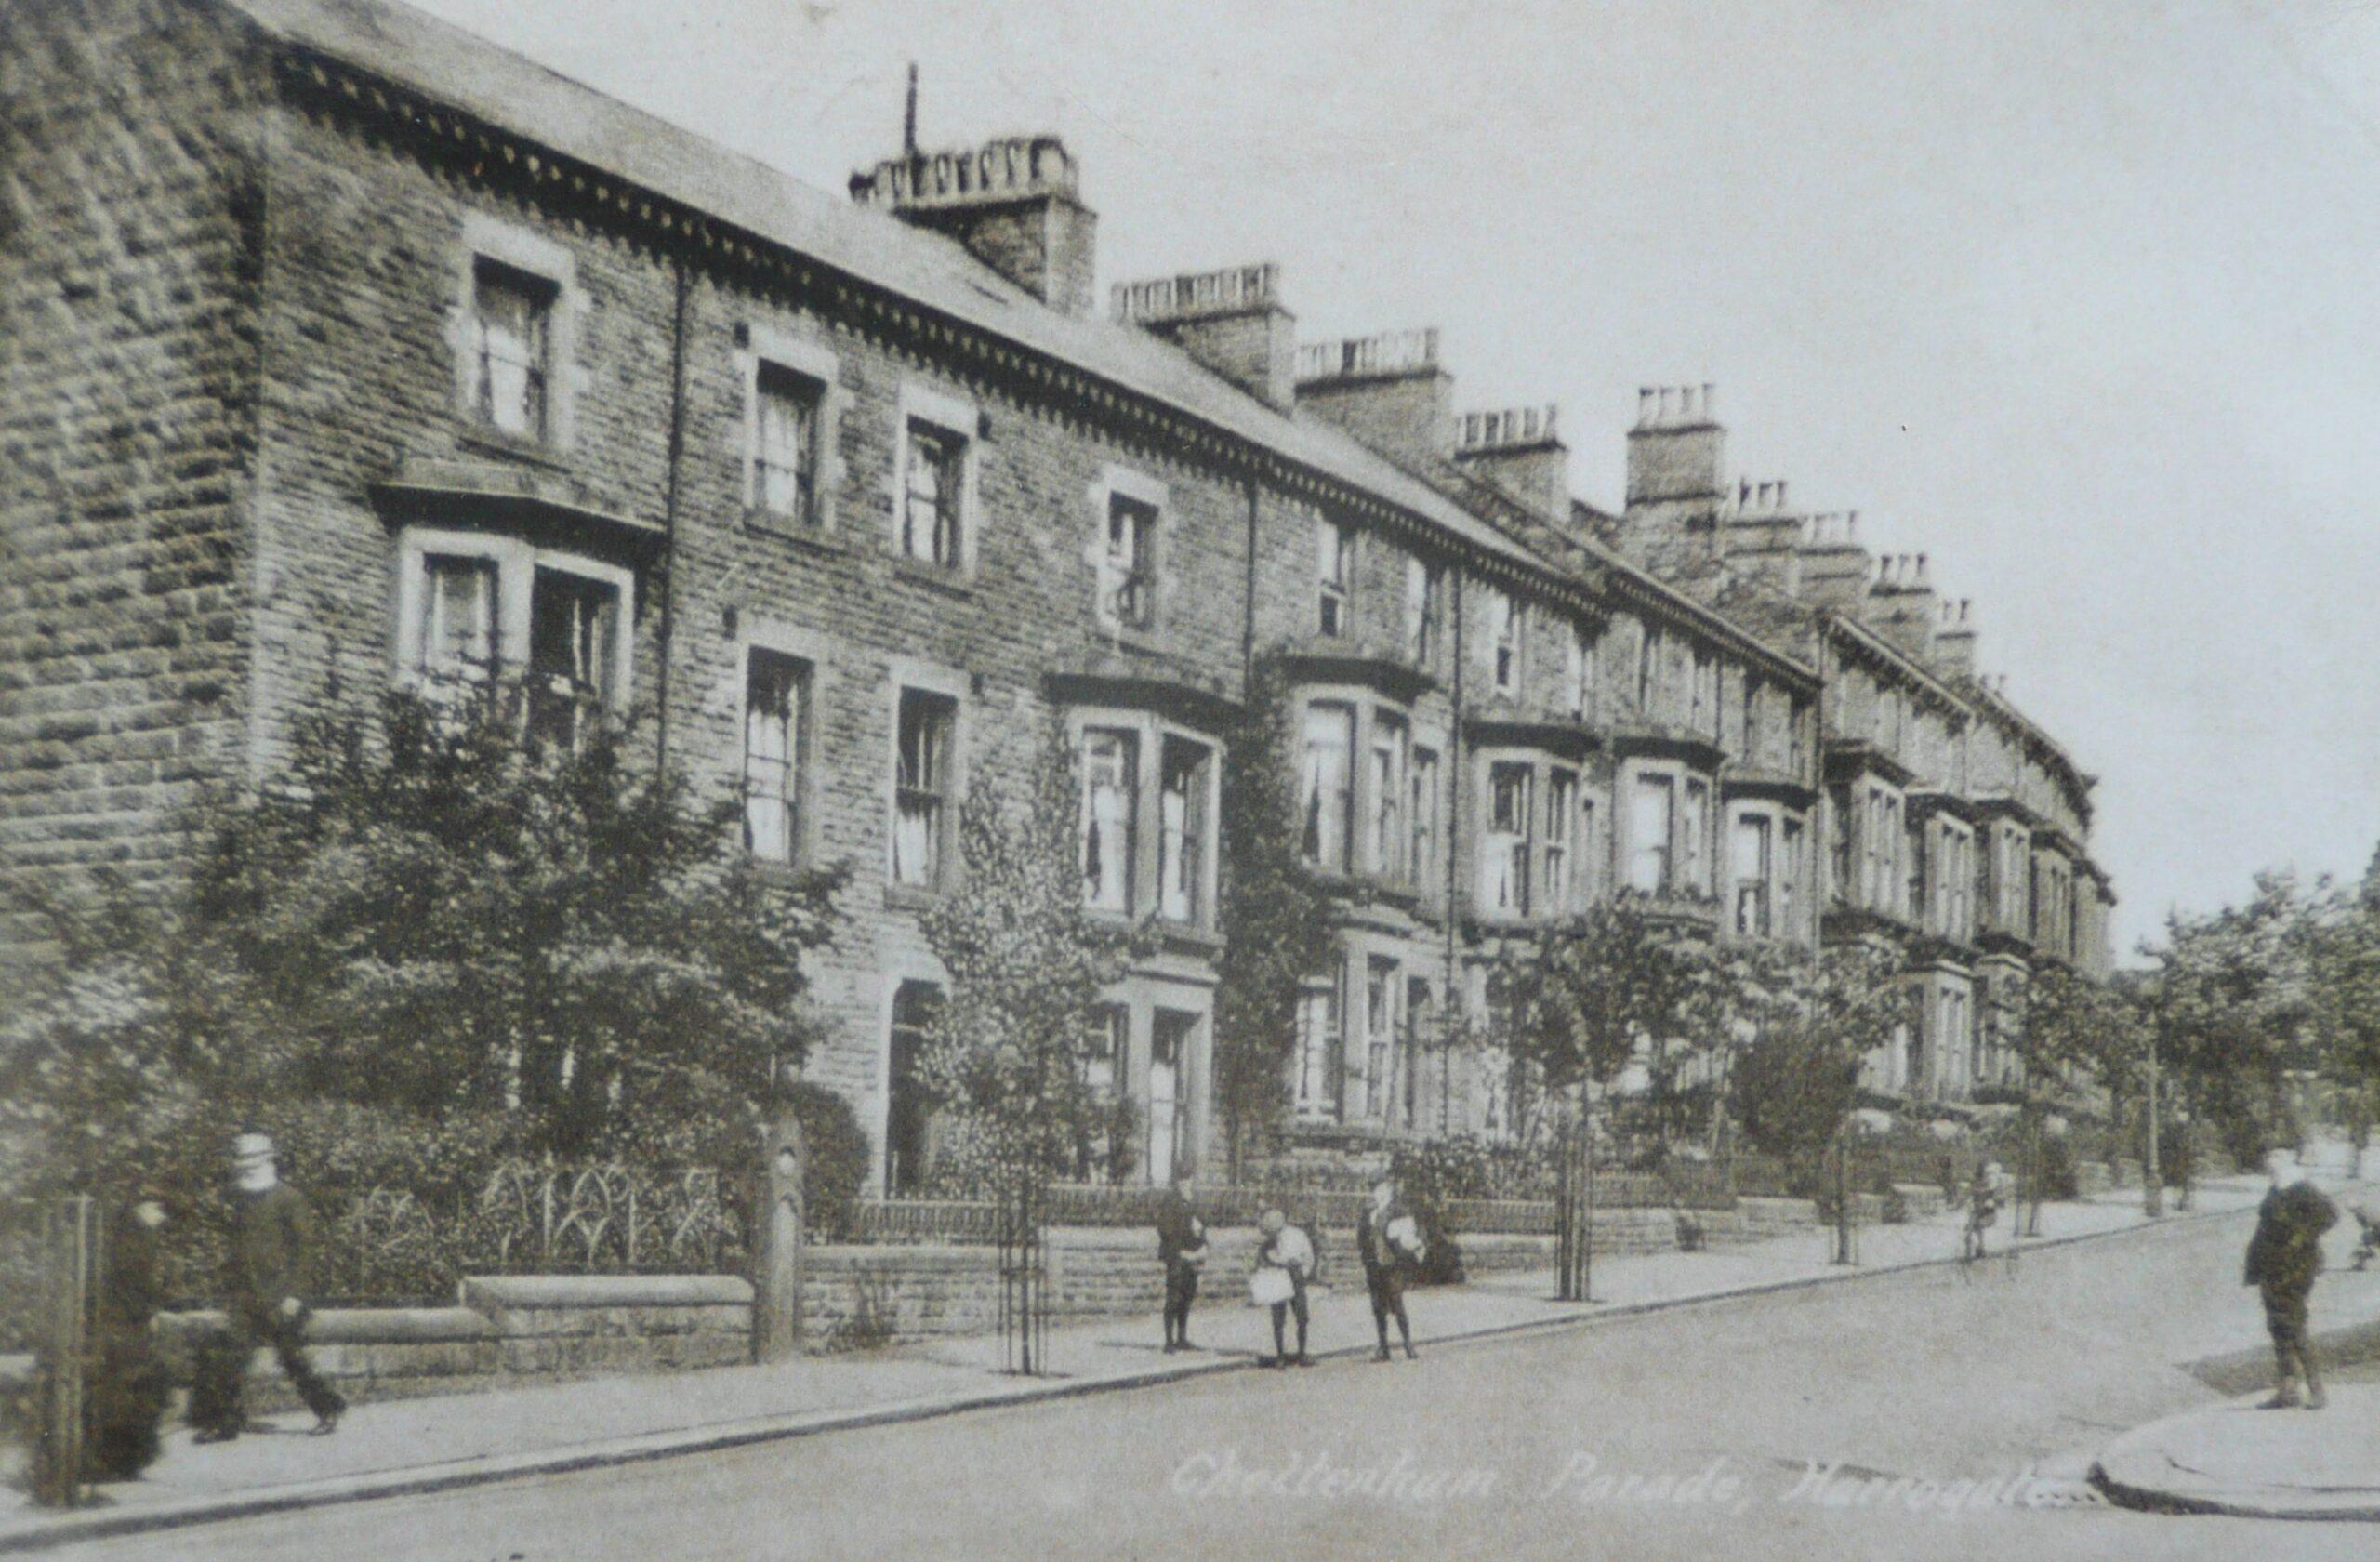 Cheltenham Parade copyright Walker-Neesam Archive